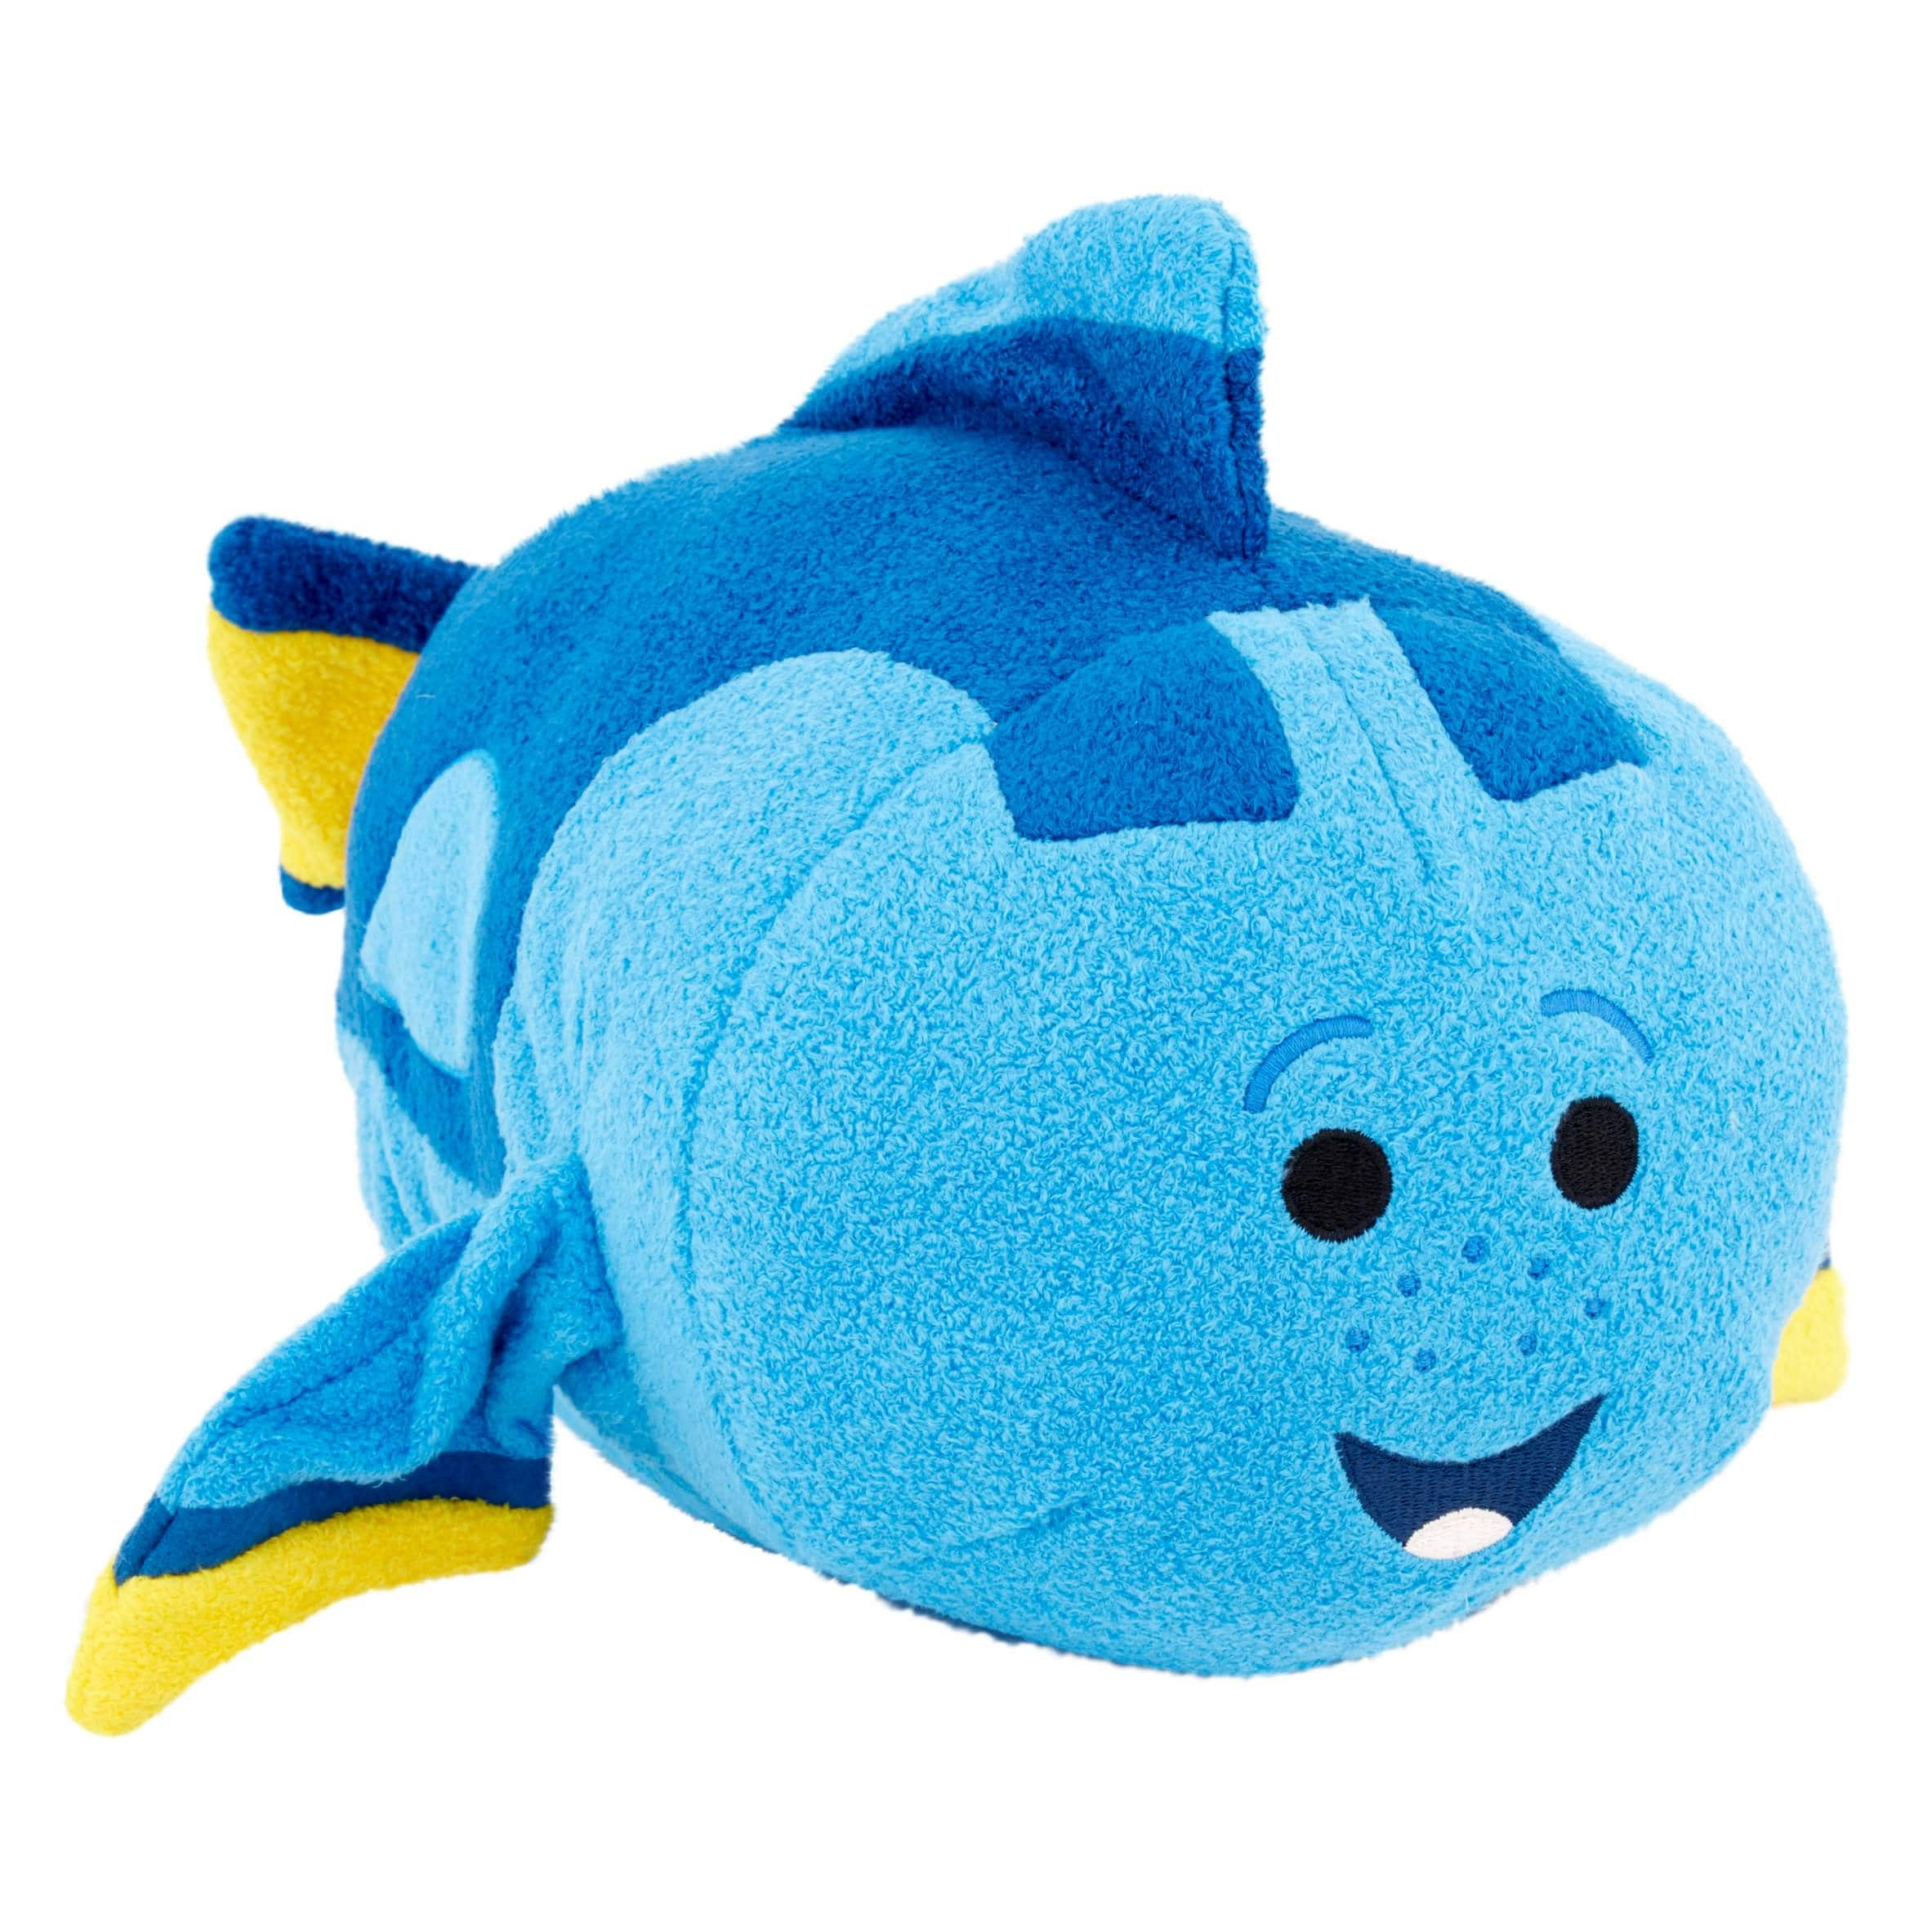 b3e4f3c28 Select Disney Tsum Tsum & FlipaZoo Plush Toys - Slickdeals.net